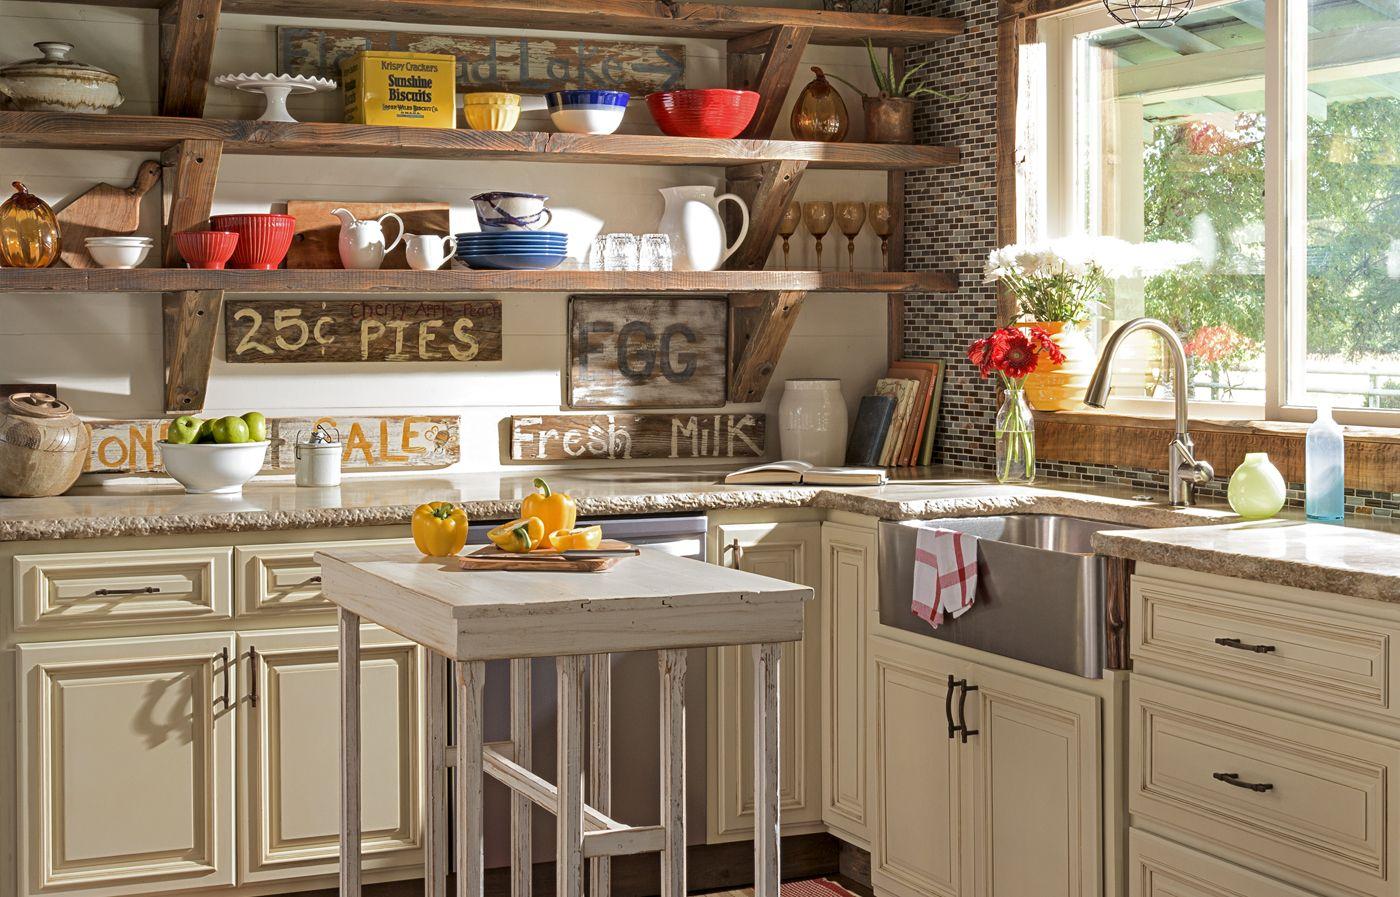 A True to Form 1929 Farmhouse   Rustic kitchen, Farmhouse ... on Rustic:yucvisfte_S= Farmhouse Kitchen Ideas  id=50057